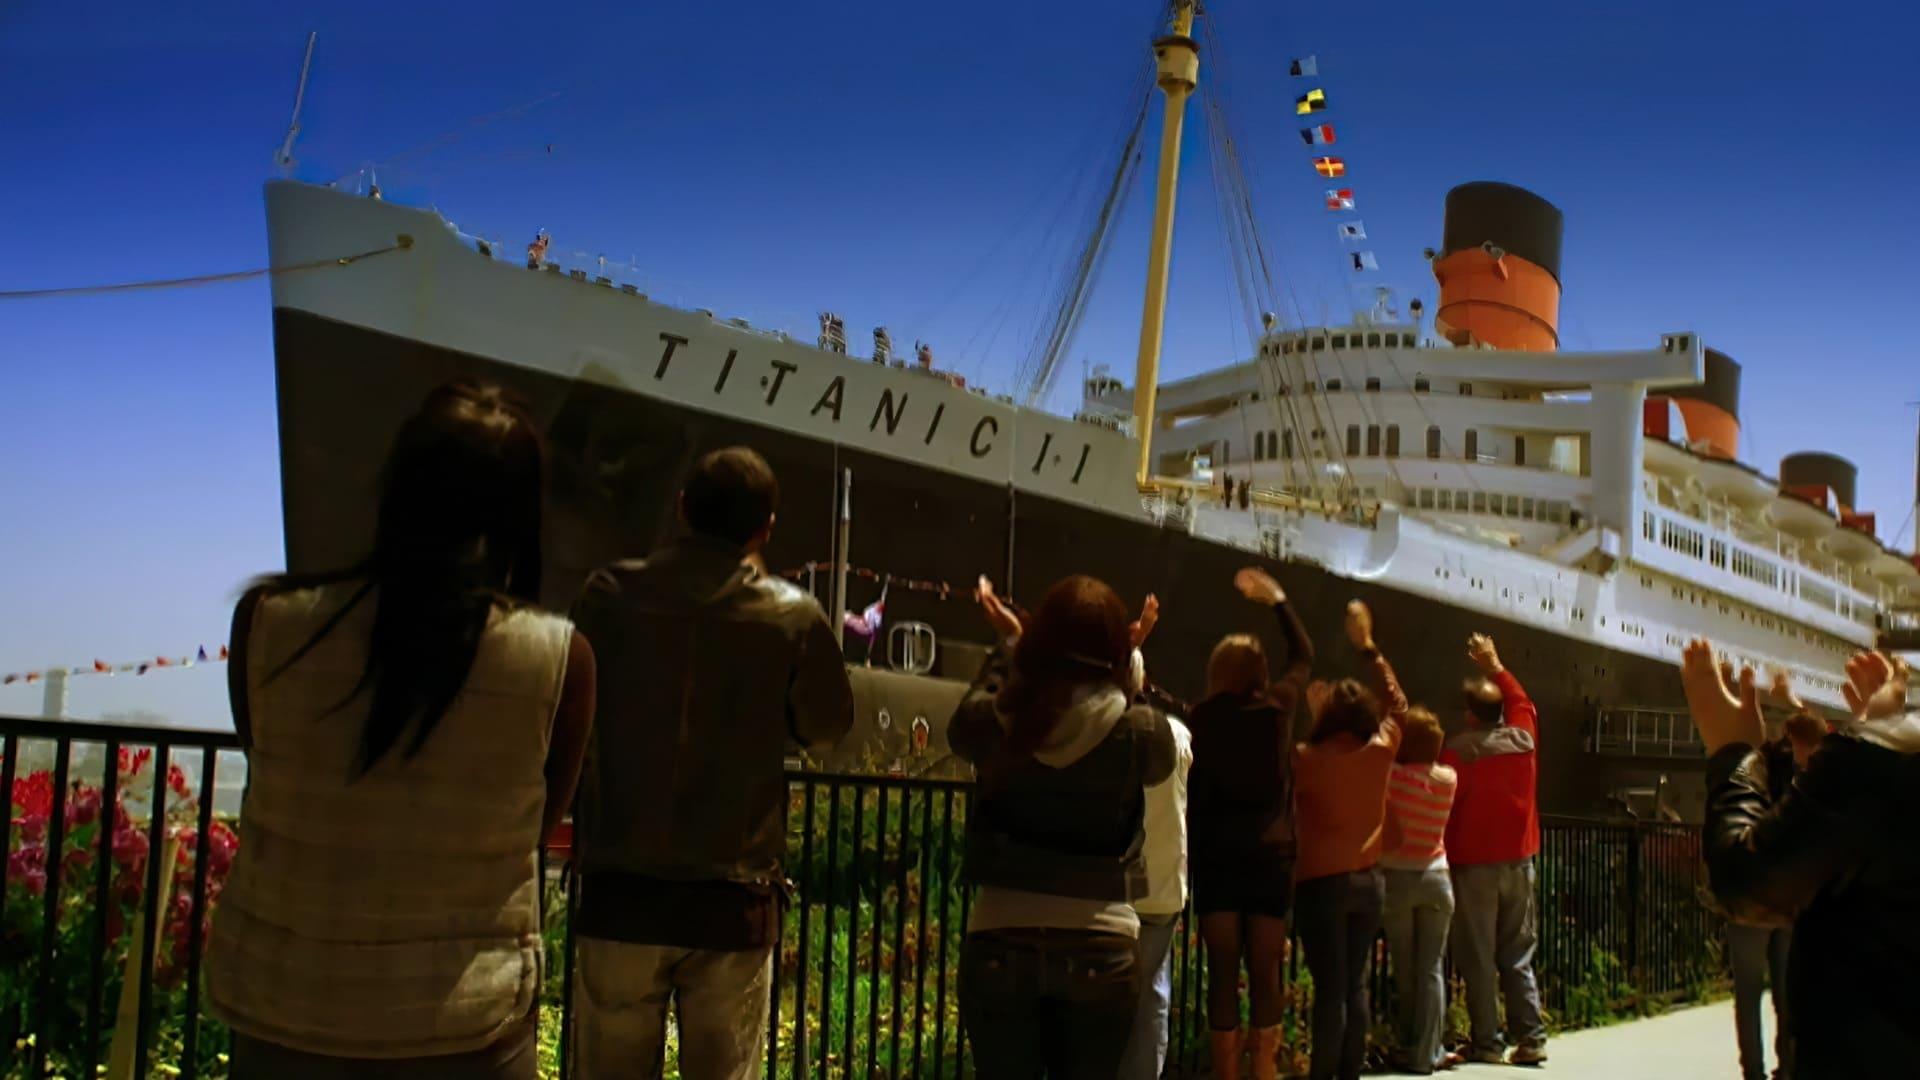 Titanic II Movie